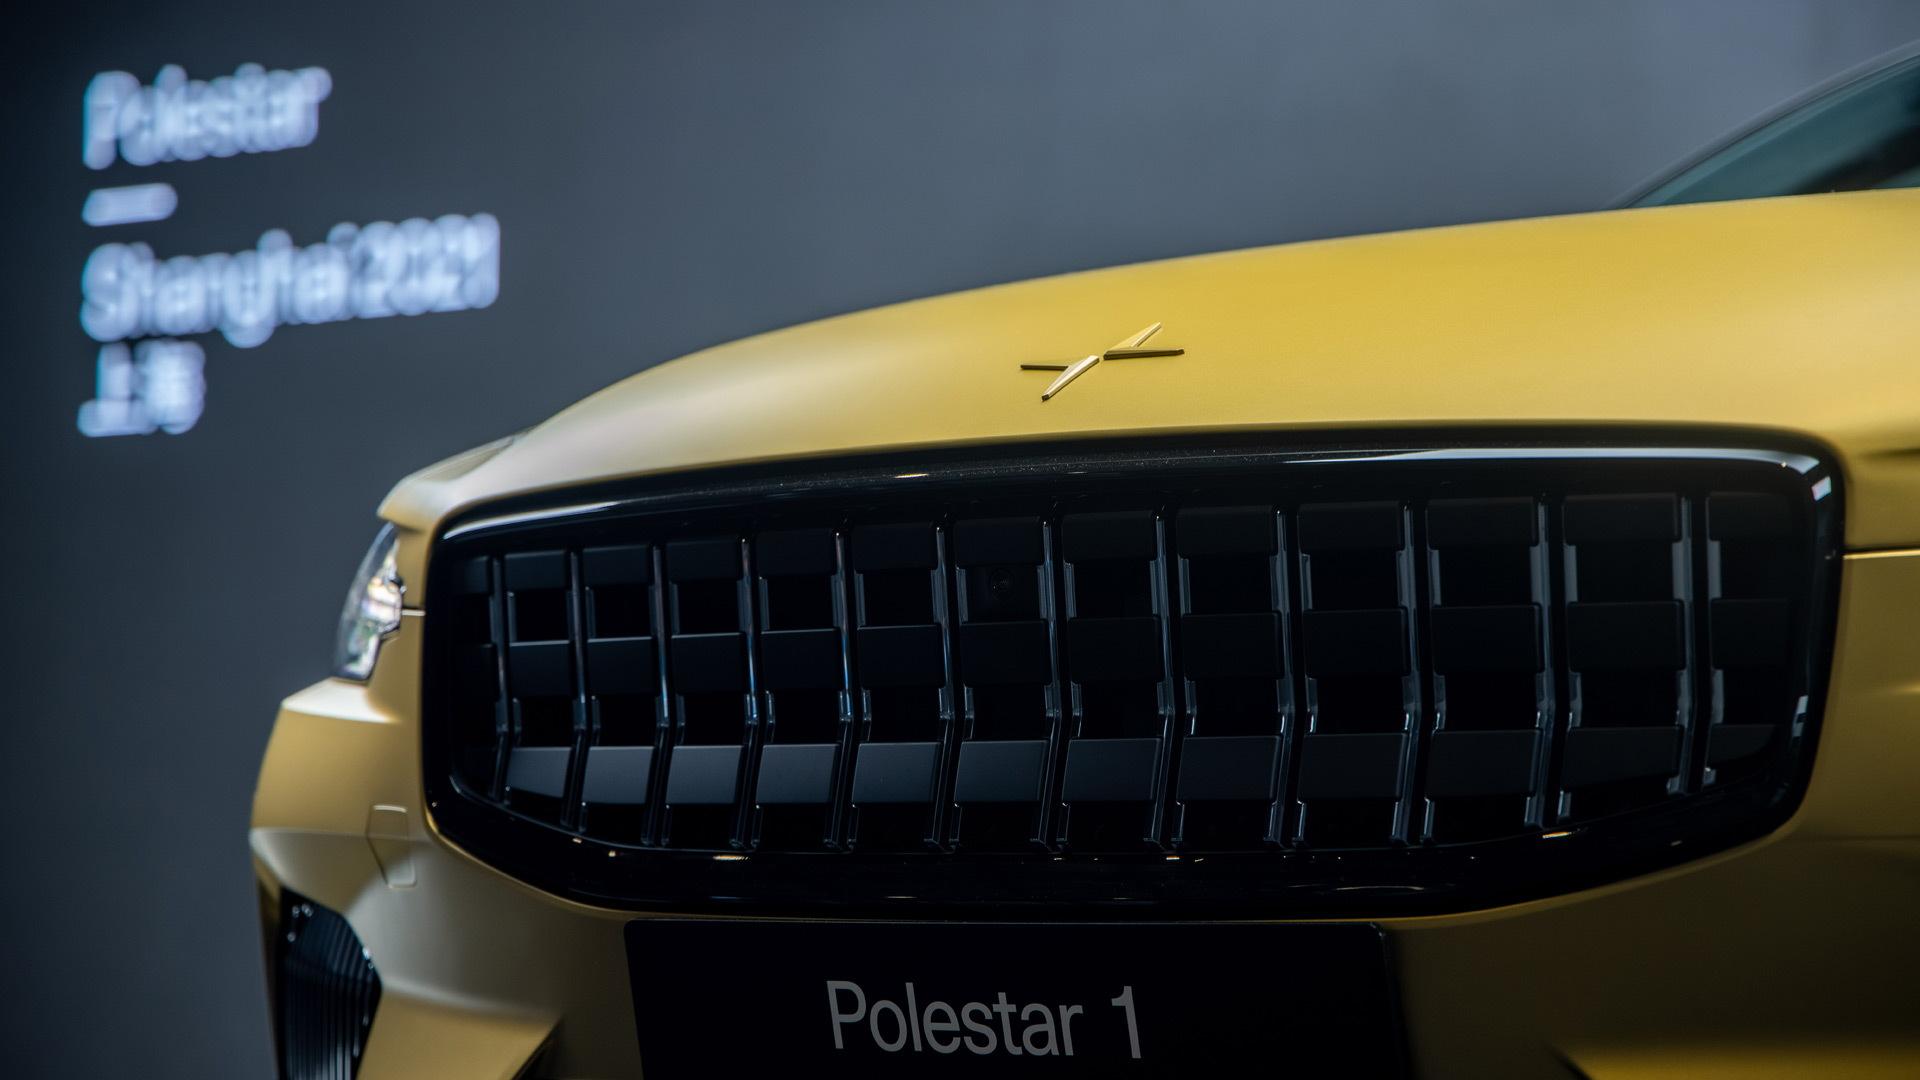 2021 Polestar 1 special edition